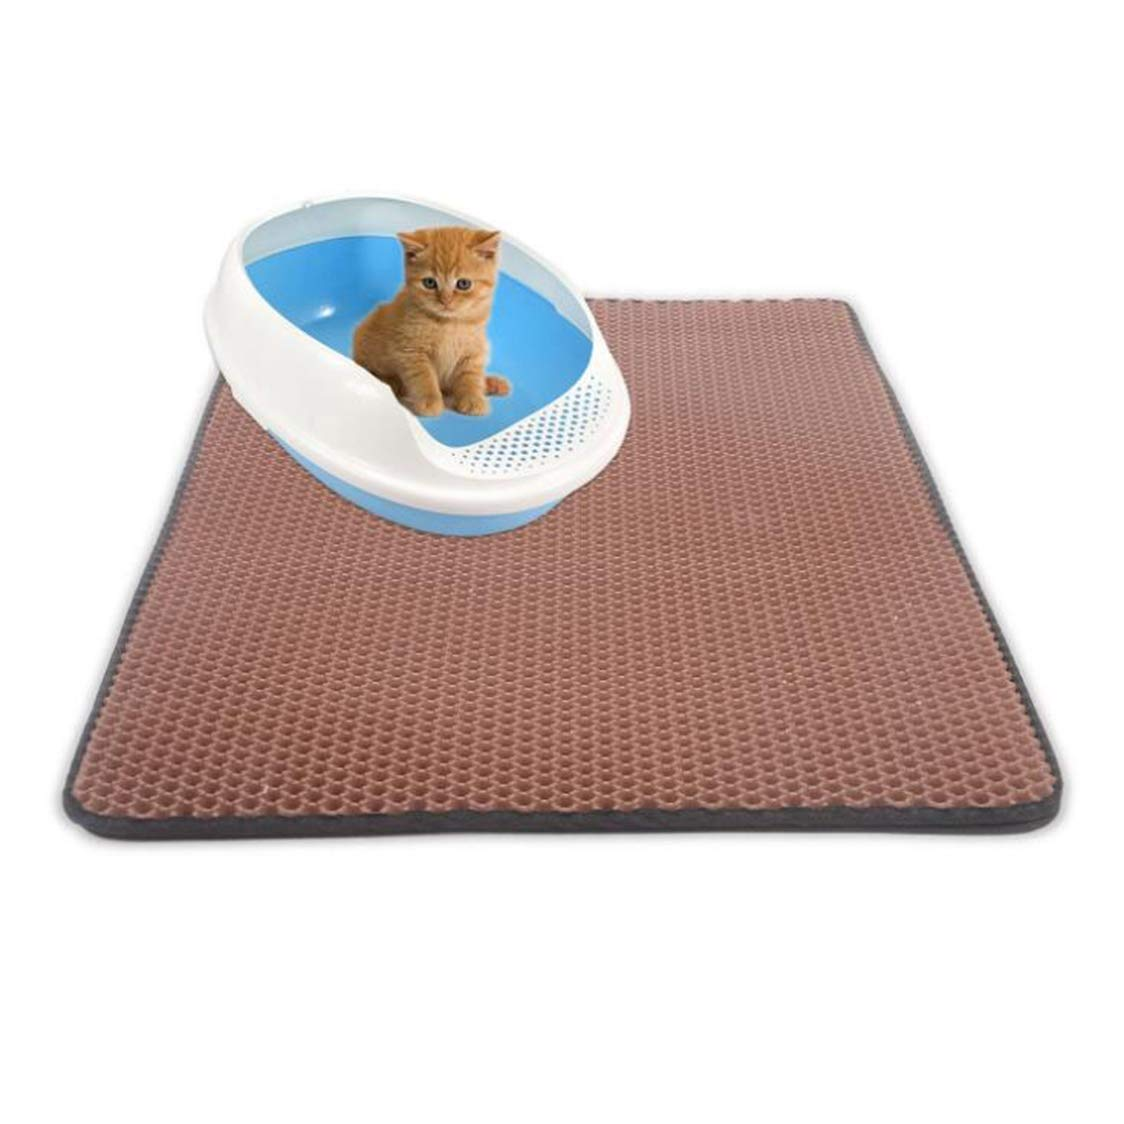 Medium Double Cat Litter Mat, Basin Mat, Cat Grab Pad, Honeycomb Double Layer Design, Waterproof Urine Material, Easy To Clean Eva Carpet, Oversized (Brown),M